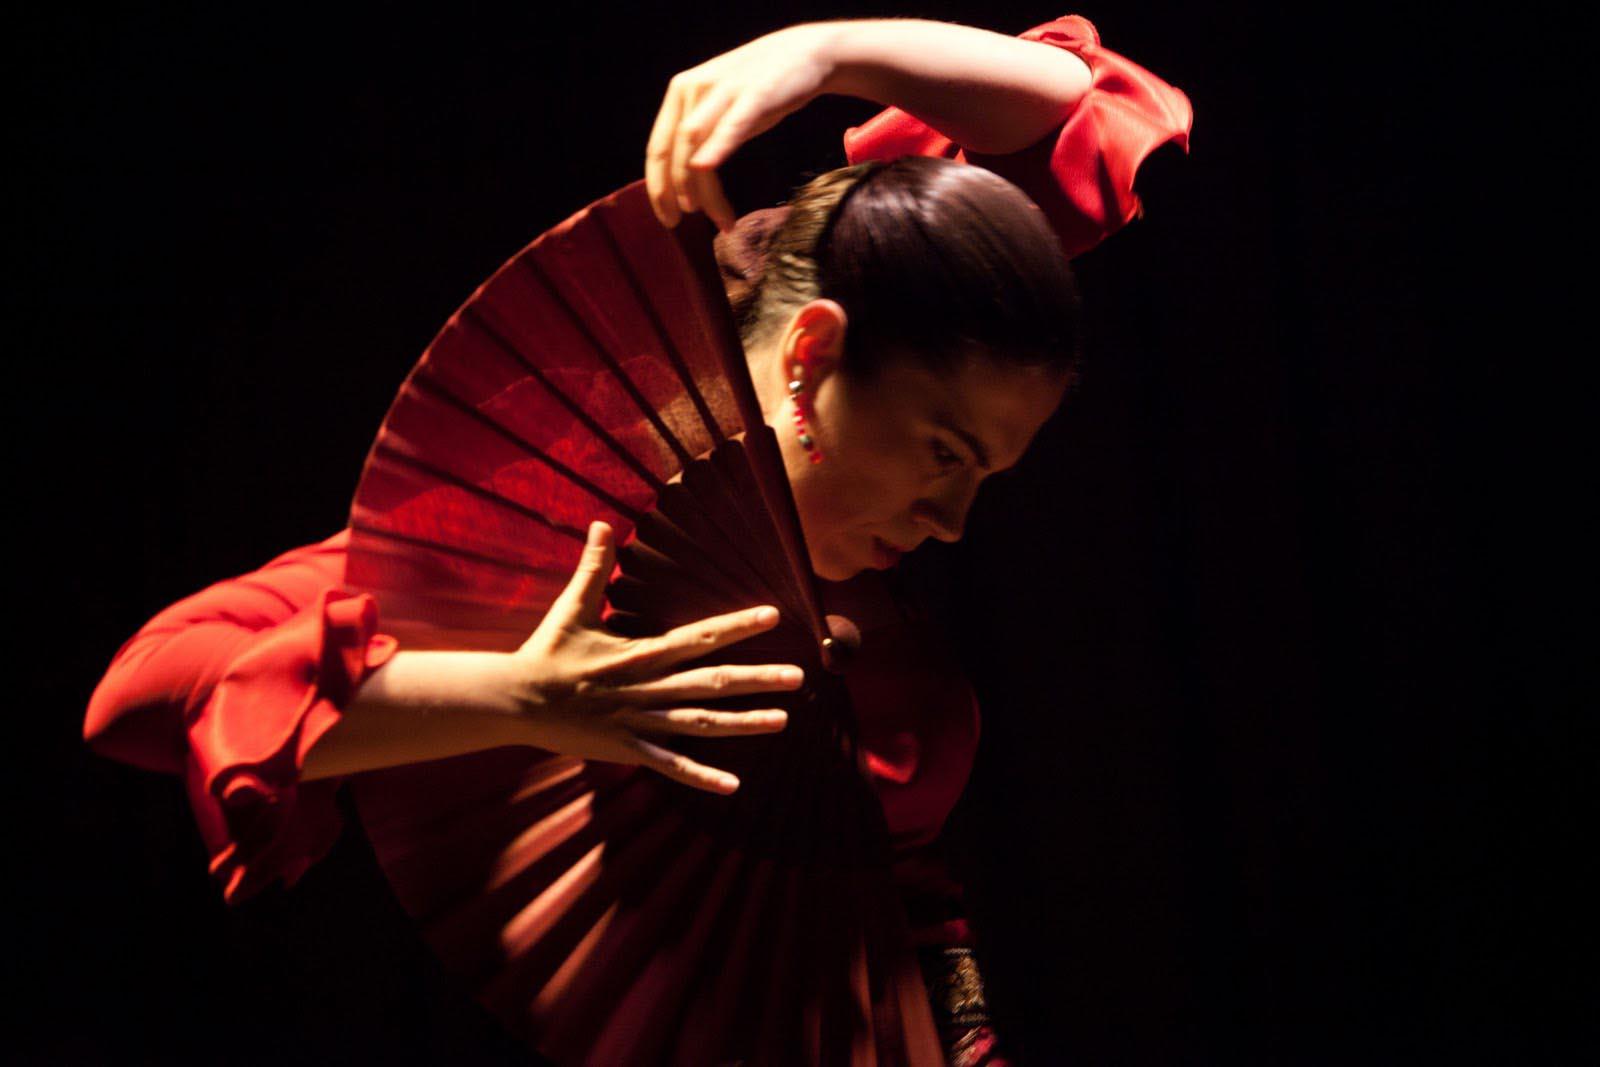 el-abanico-flamenco-2